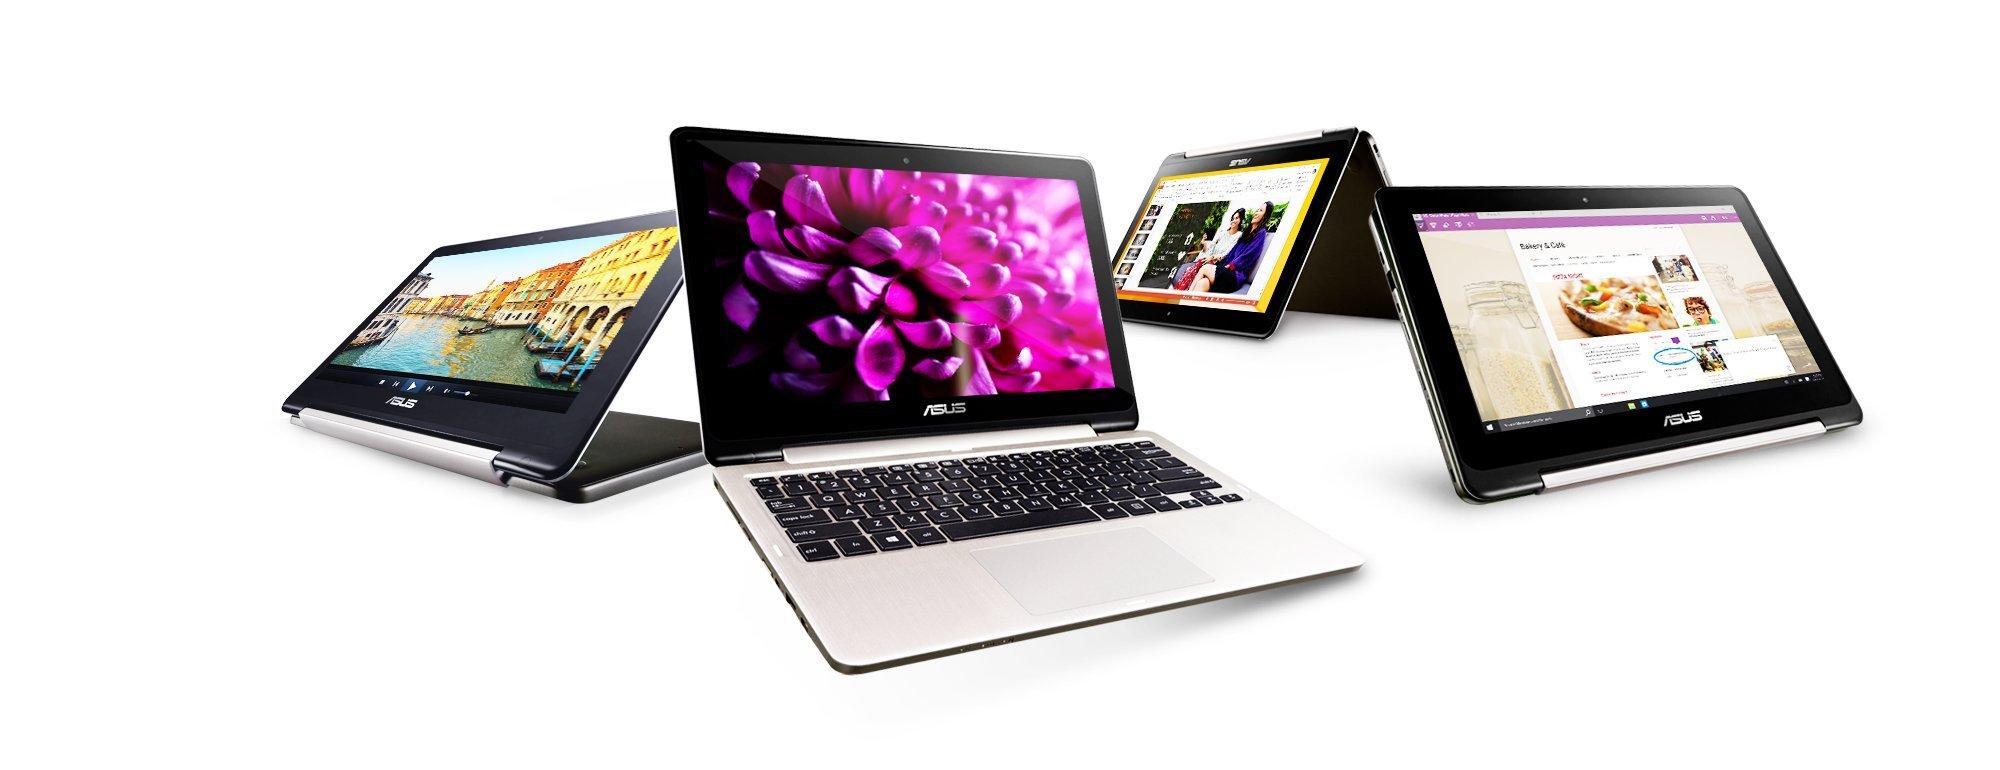 Nhiều cải tiến cho laptop 2-trong-1 Transformer Book Series